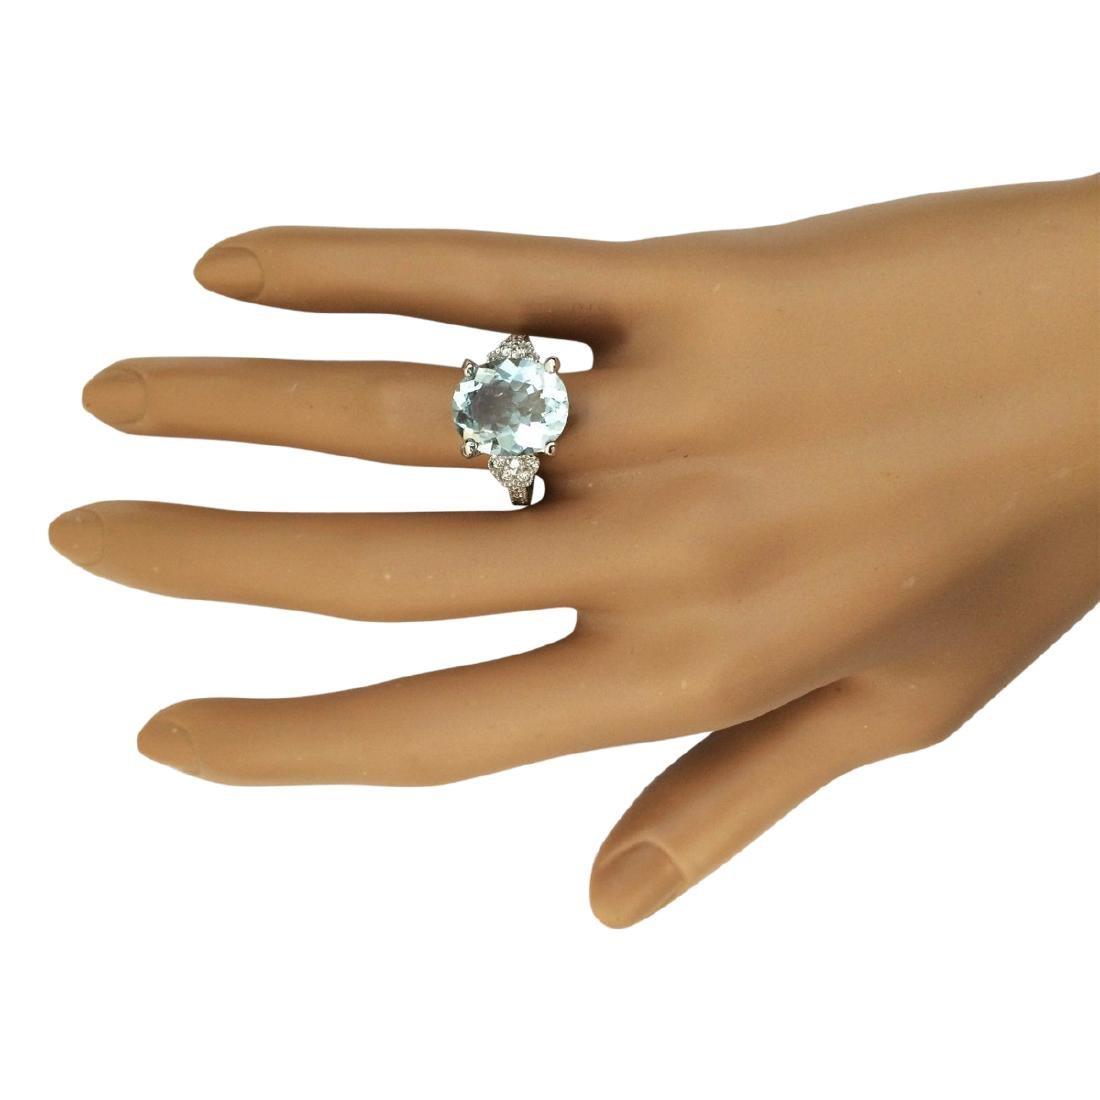 5.89 CTW Natural Aquamarine And Diamond Ring In 18K - 4